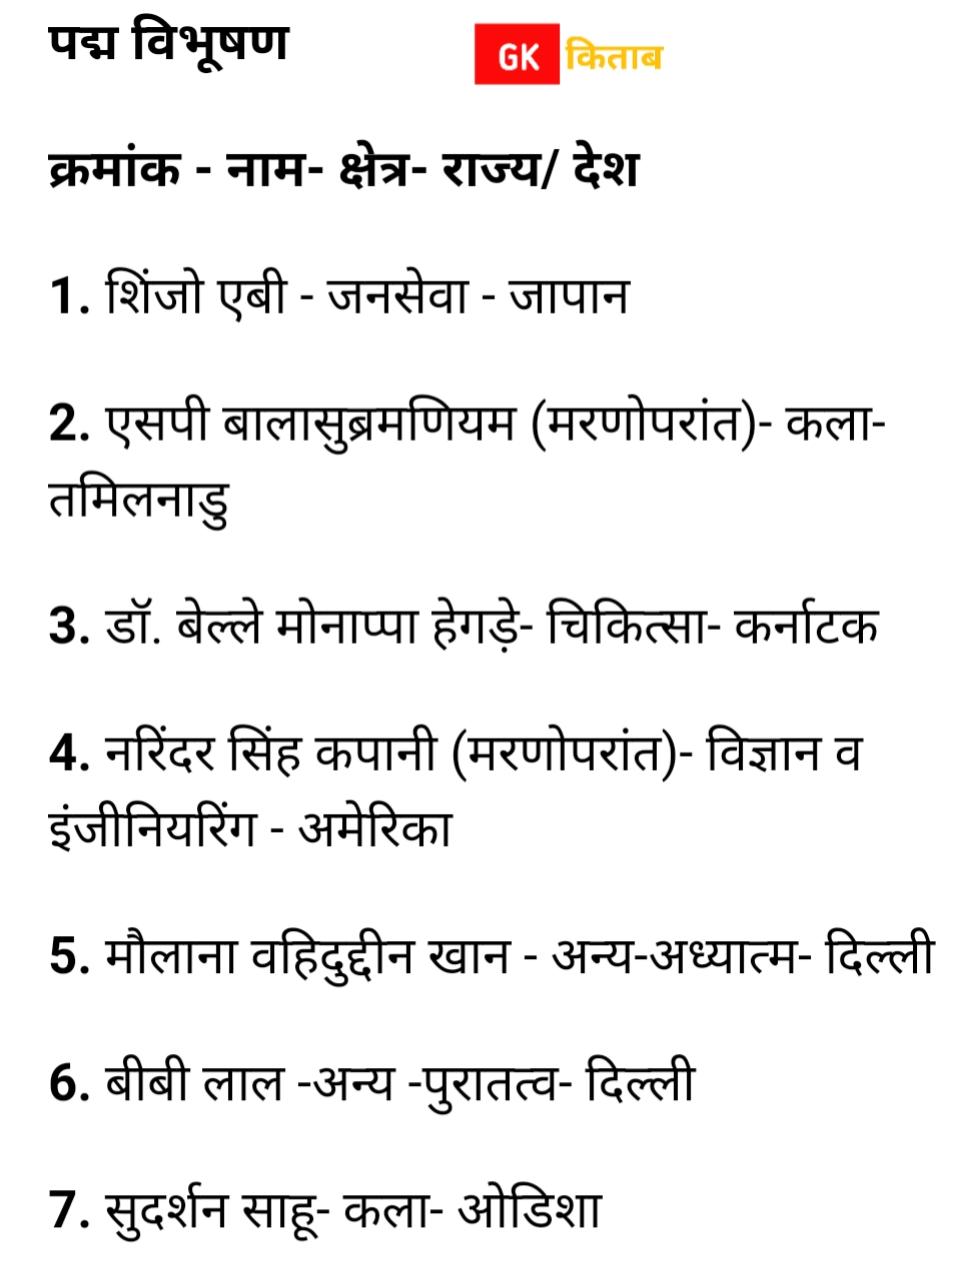 Padma vibhushan award 2021